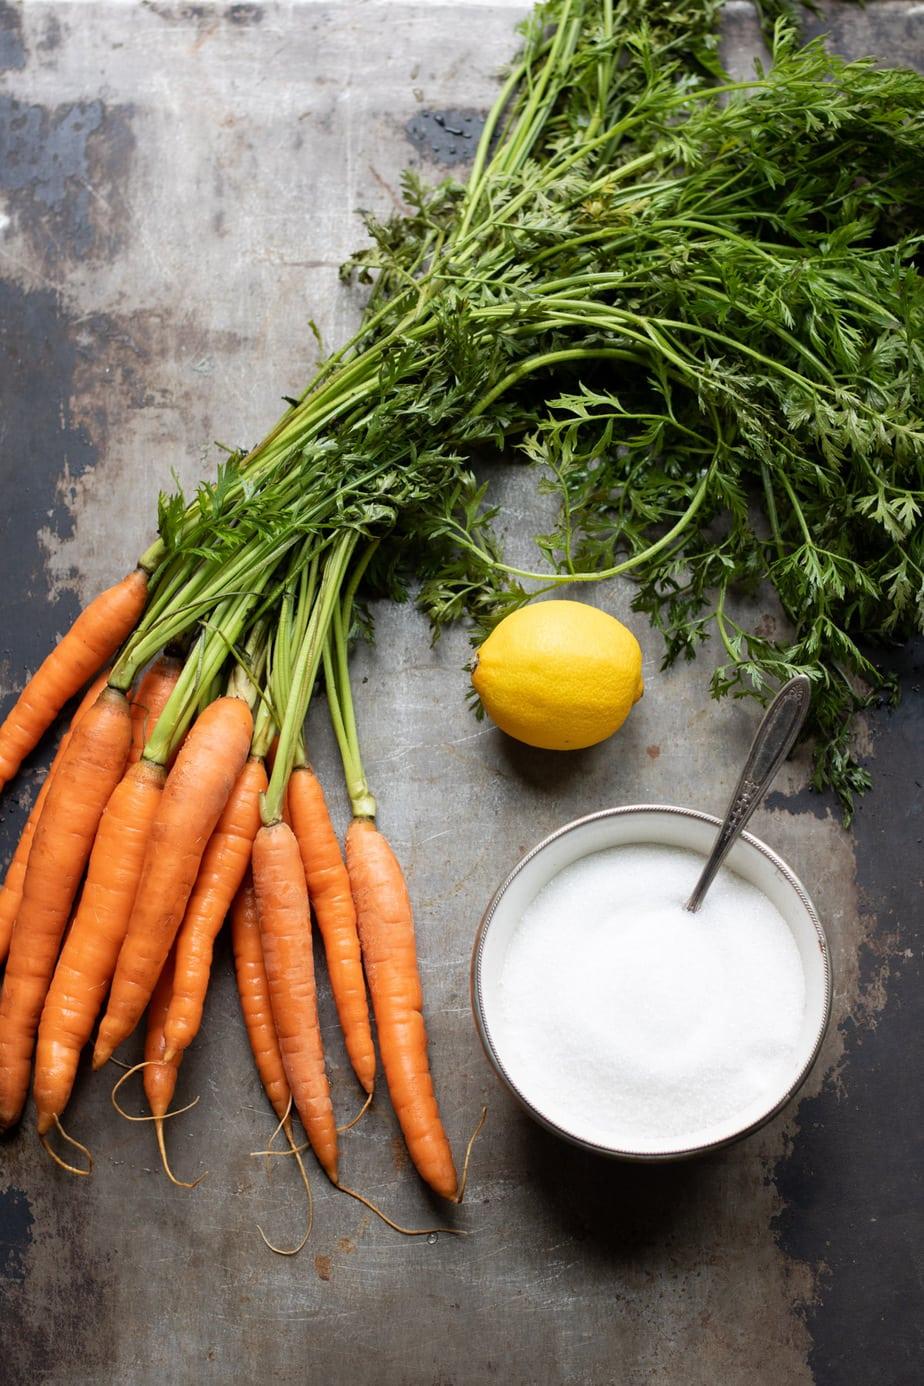 Carrots, lemon and sugar on a table.